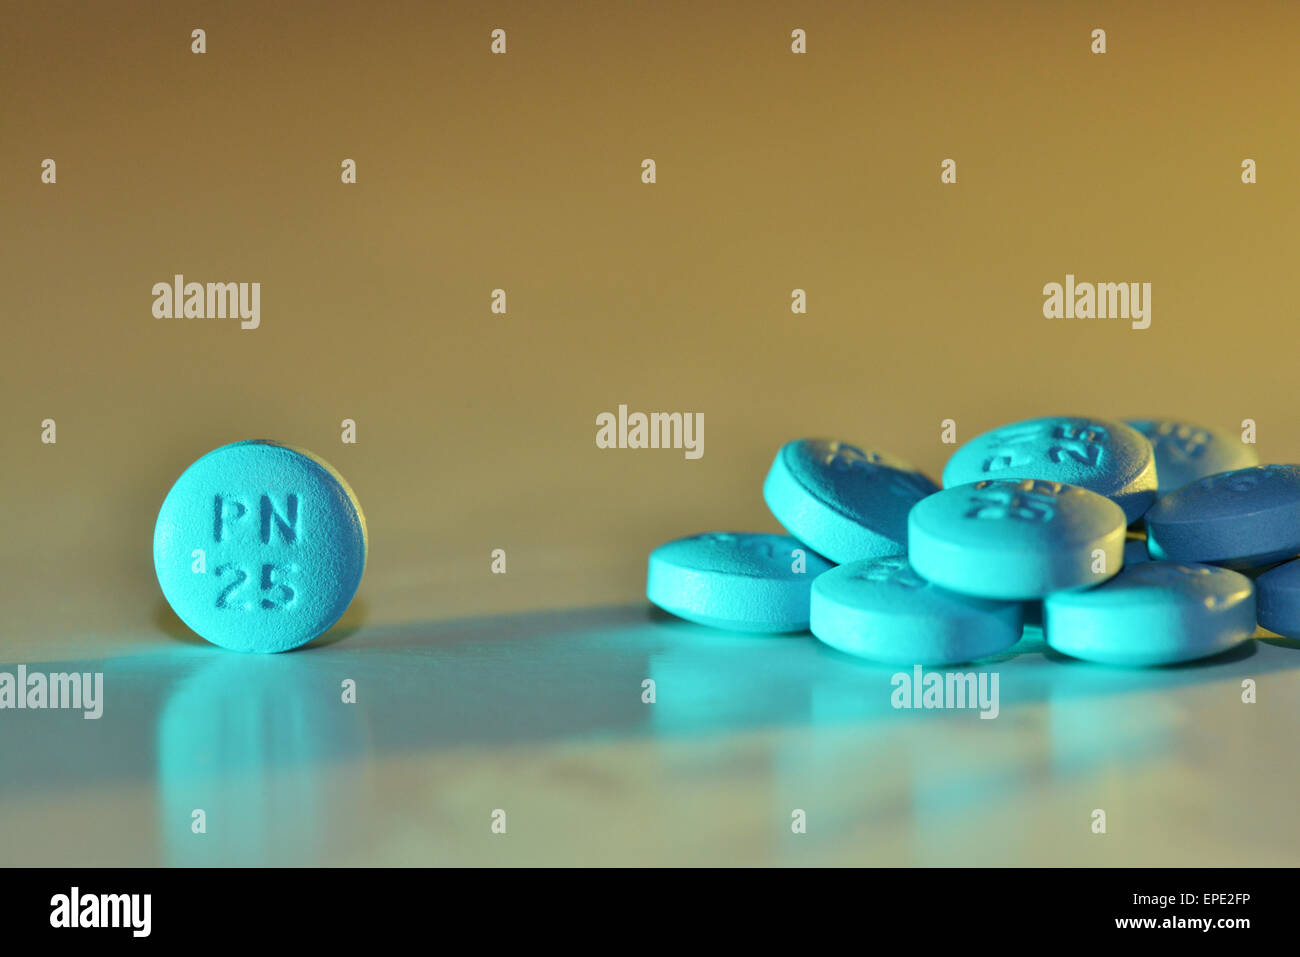 Phenergan tablets - Stock Image